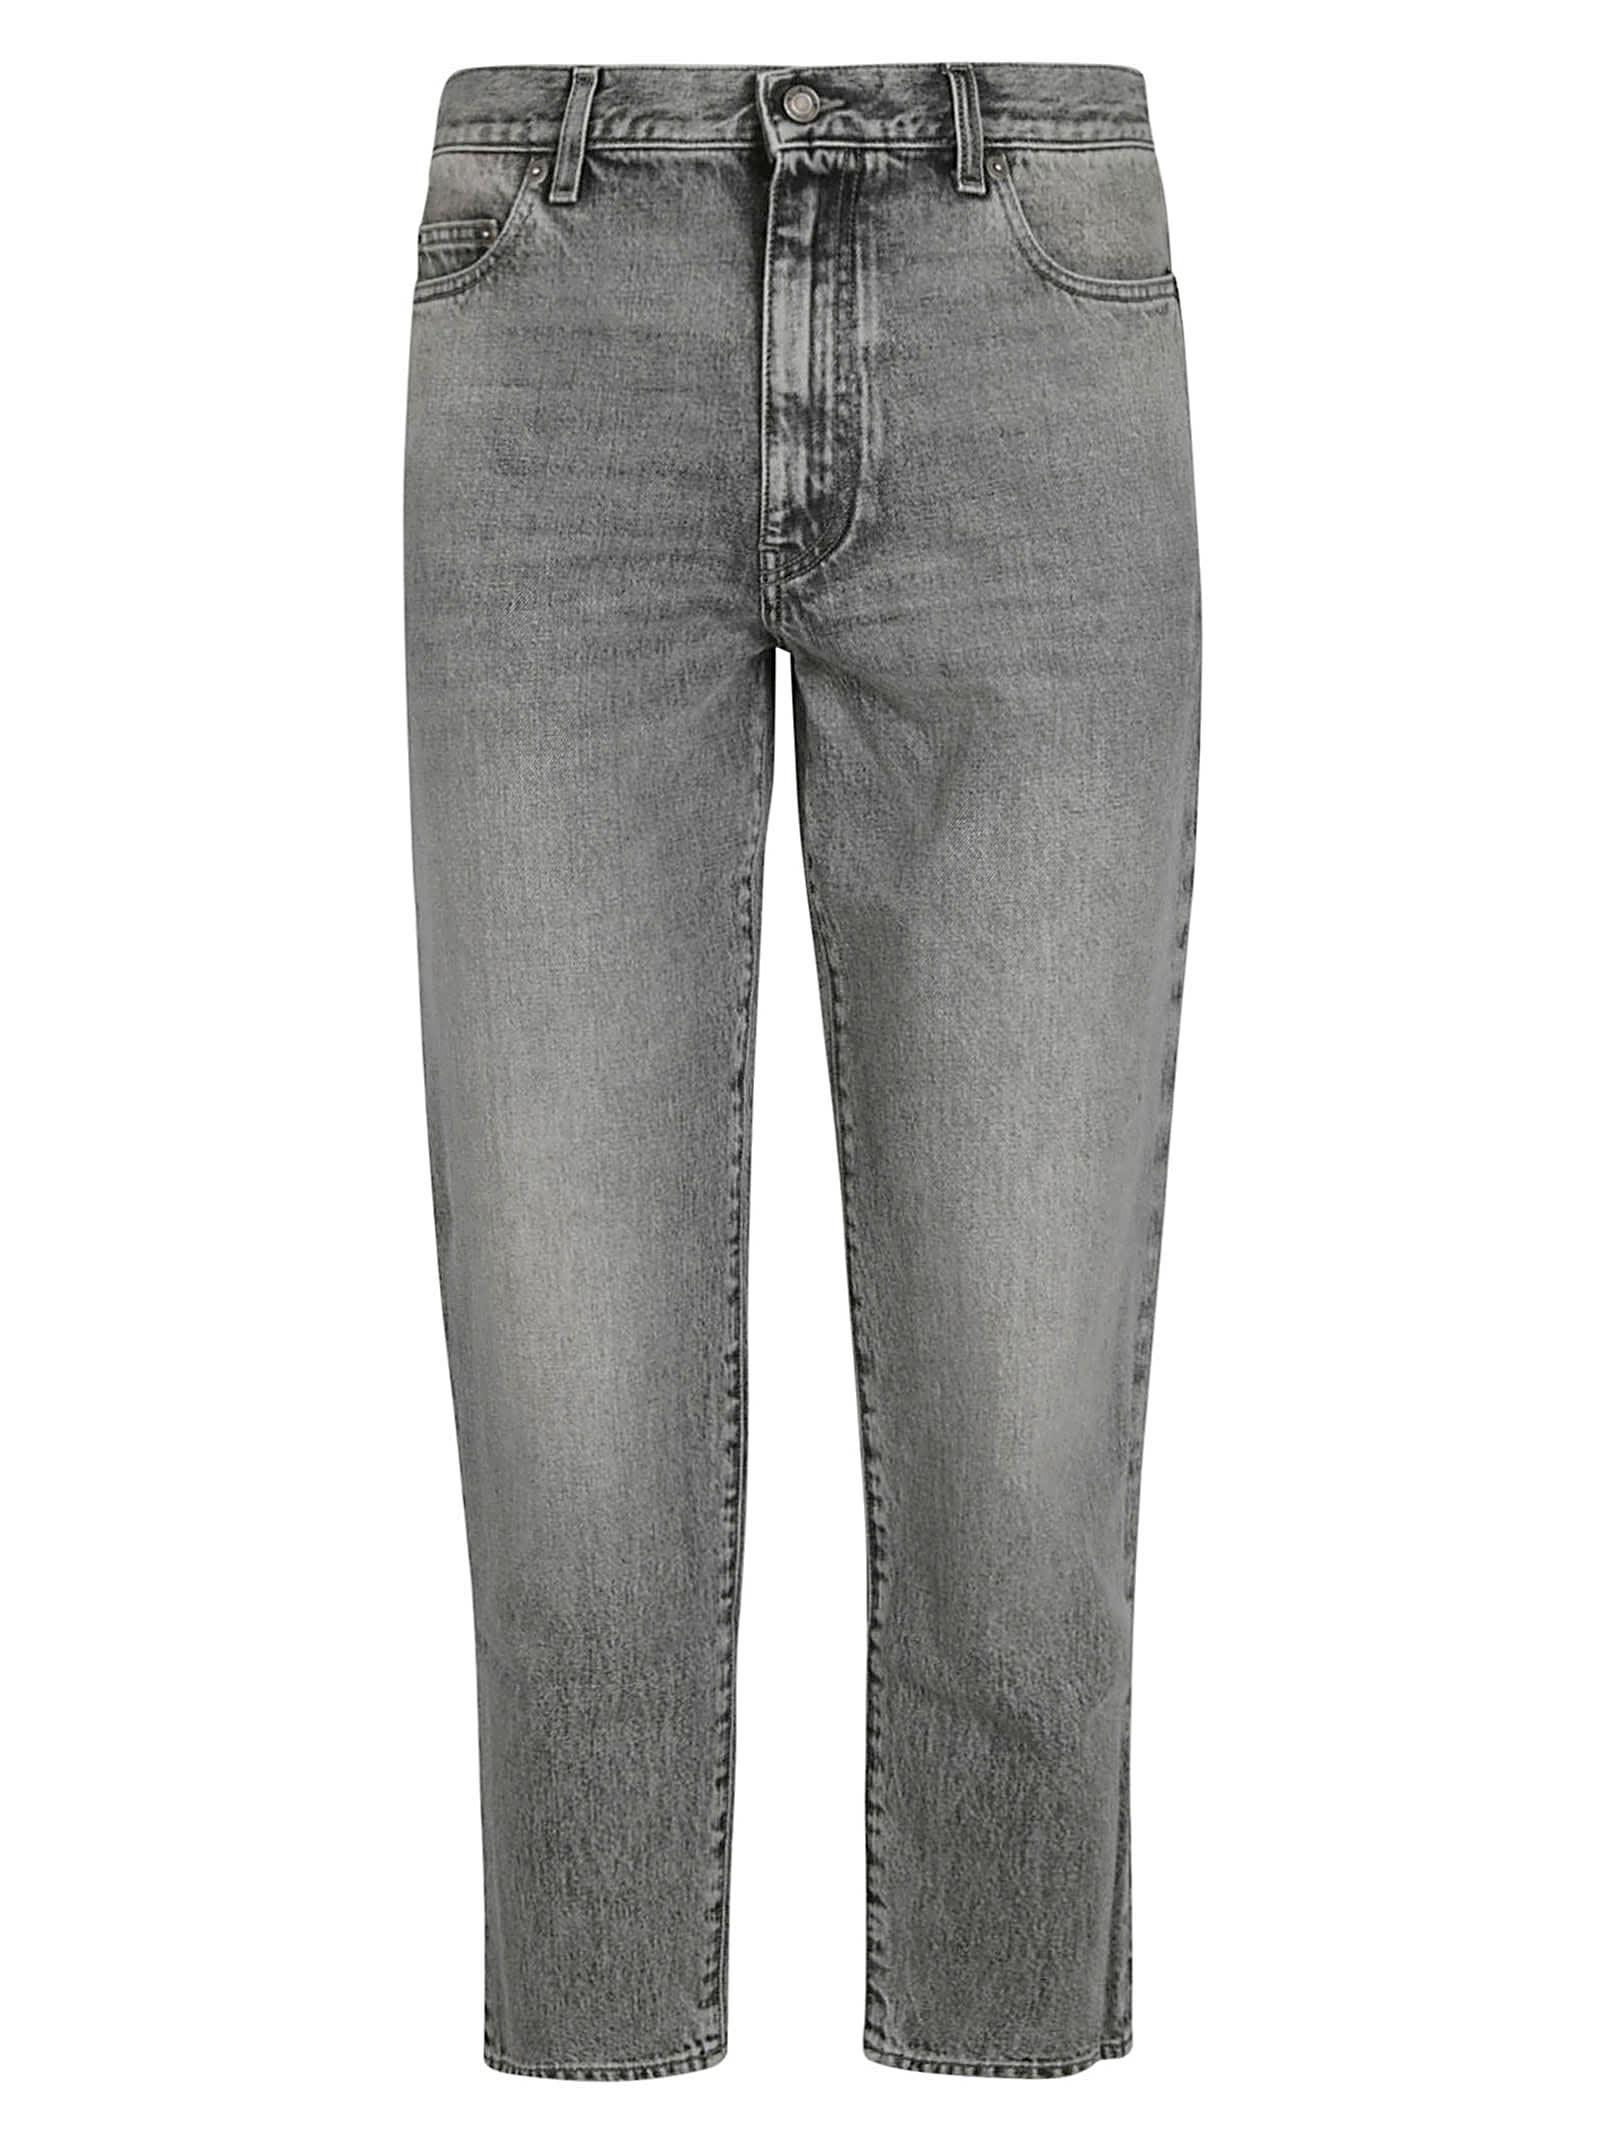 Saint Laurent Regular Stonewashed Jeans